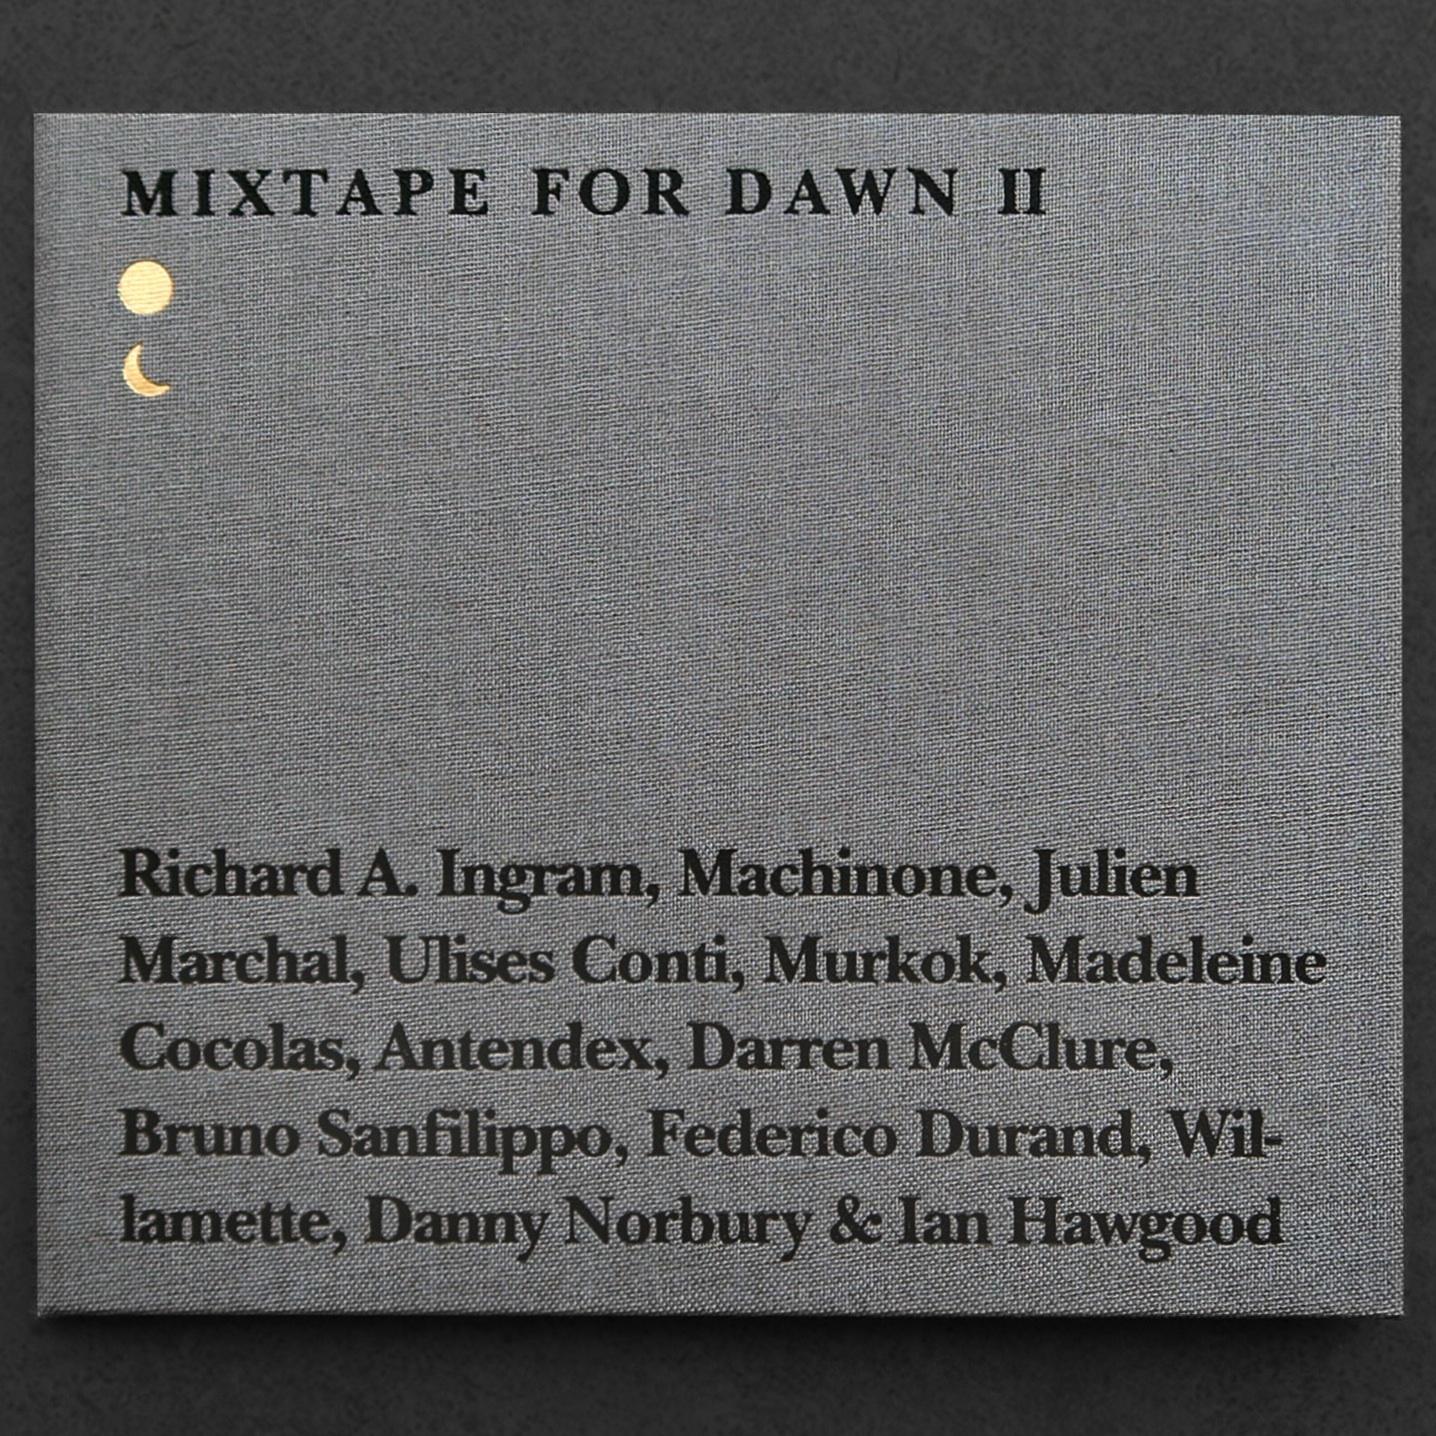 MIXTAPE FOR DAWN II